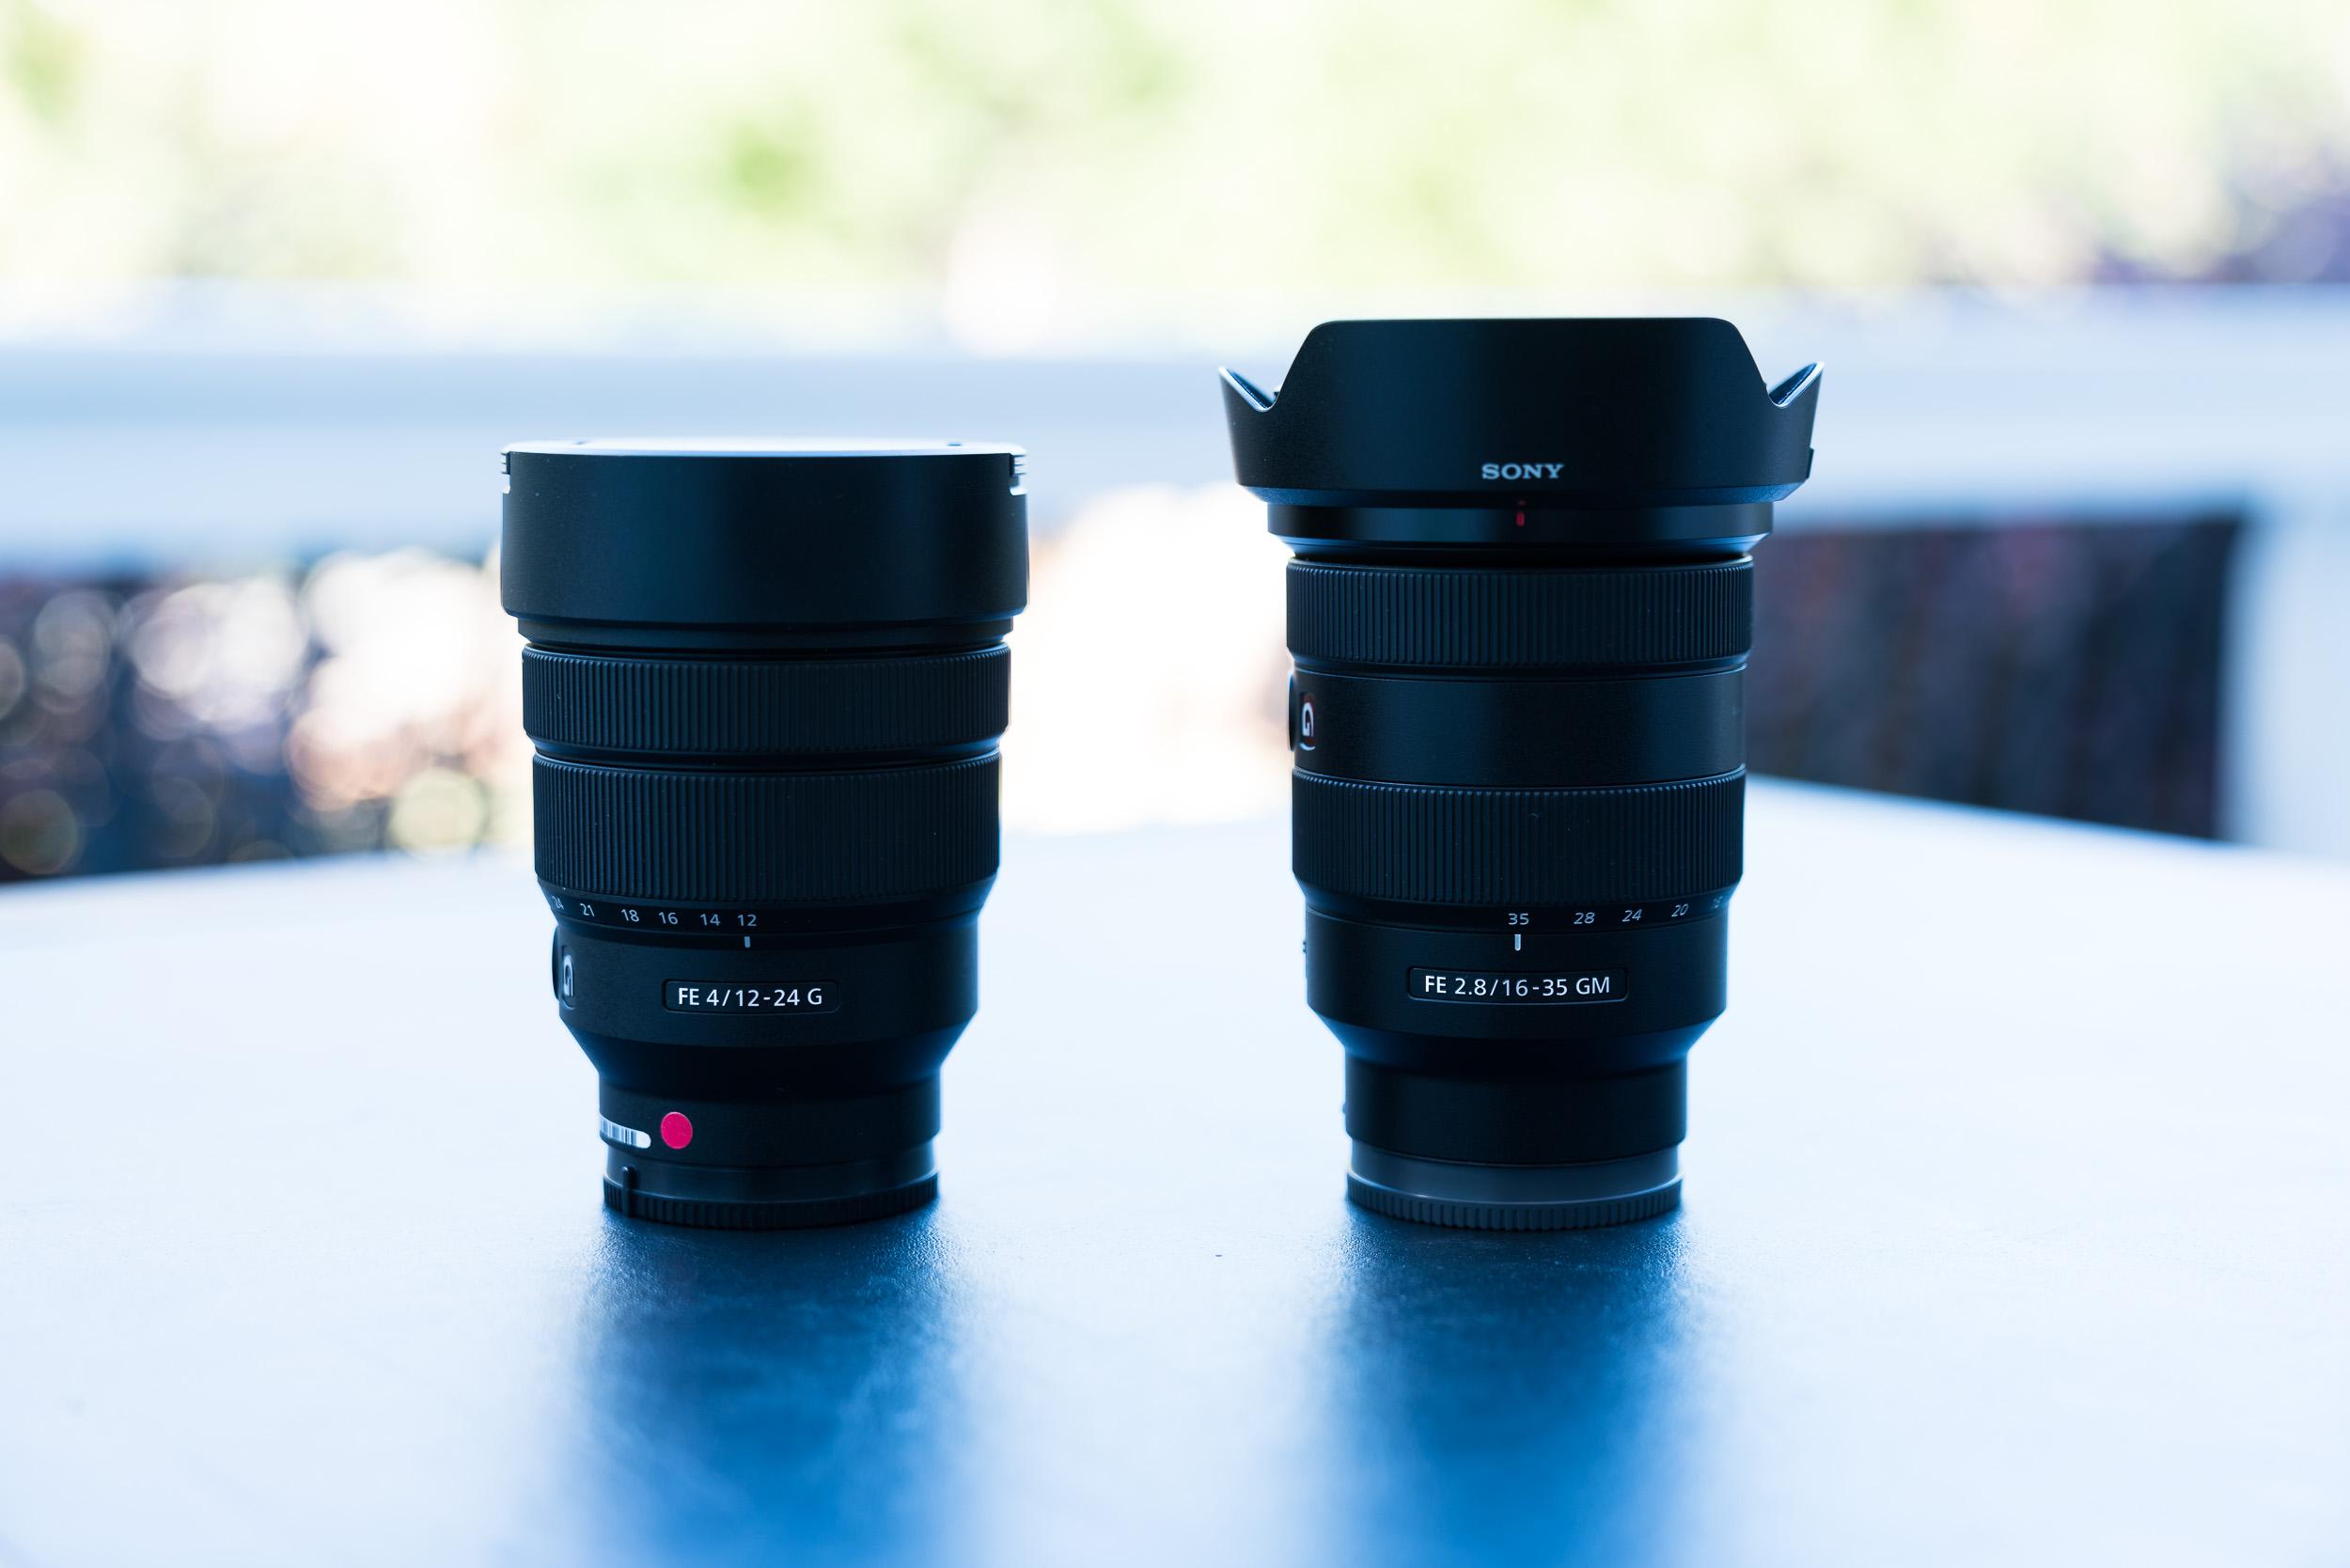 Sony 12-24mm G f/4 left, Sony 16-35mm GM f/2.8 right.